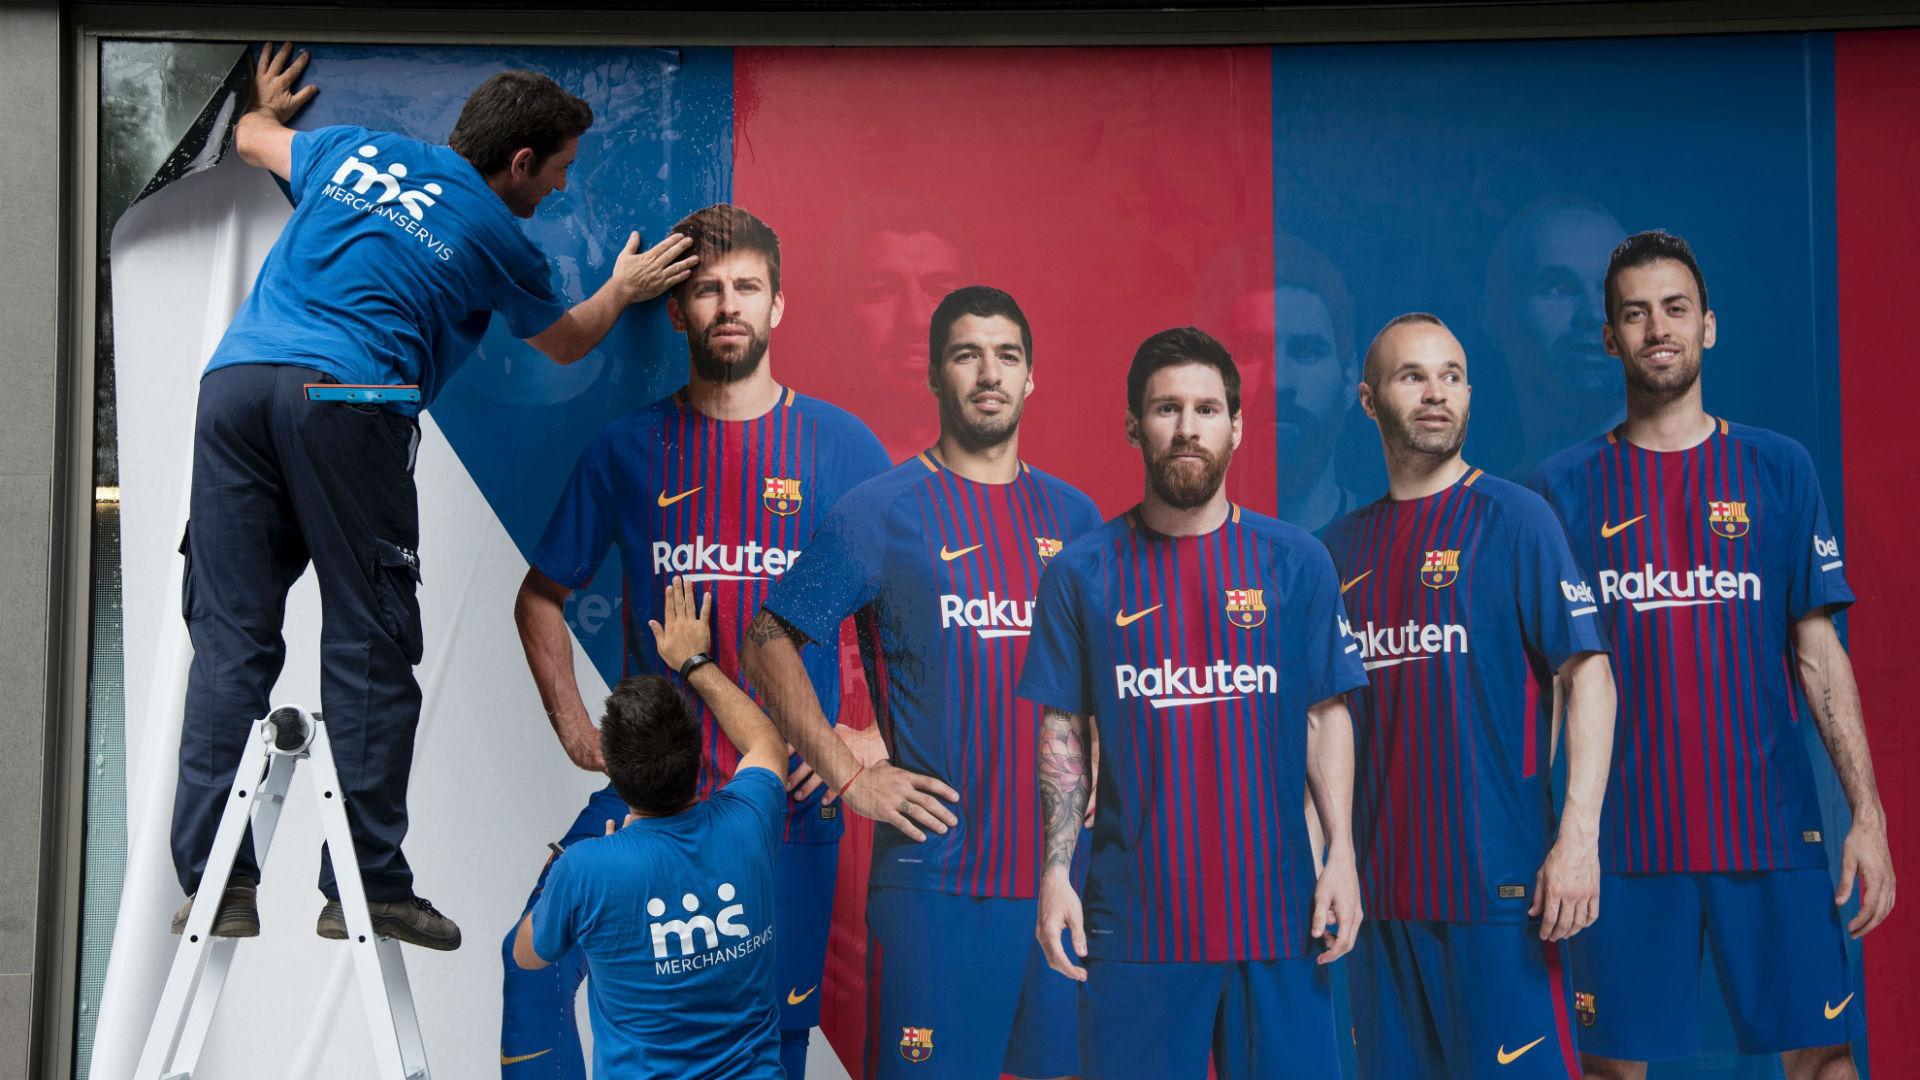 Barca Neymar posters